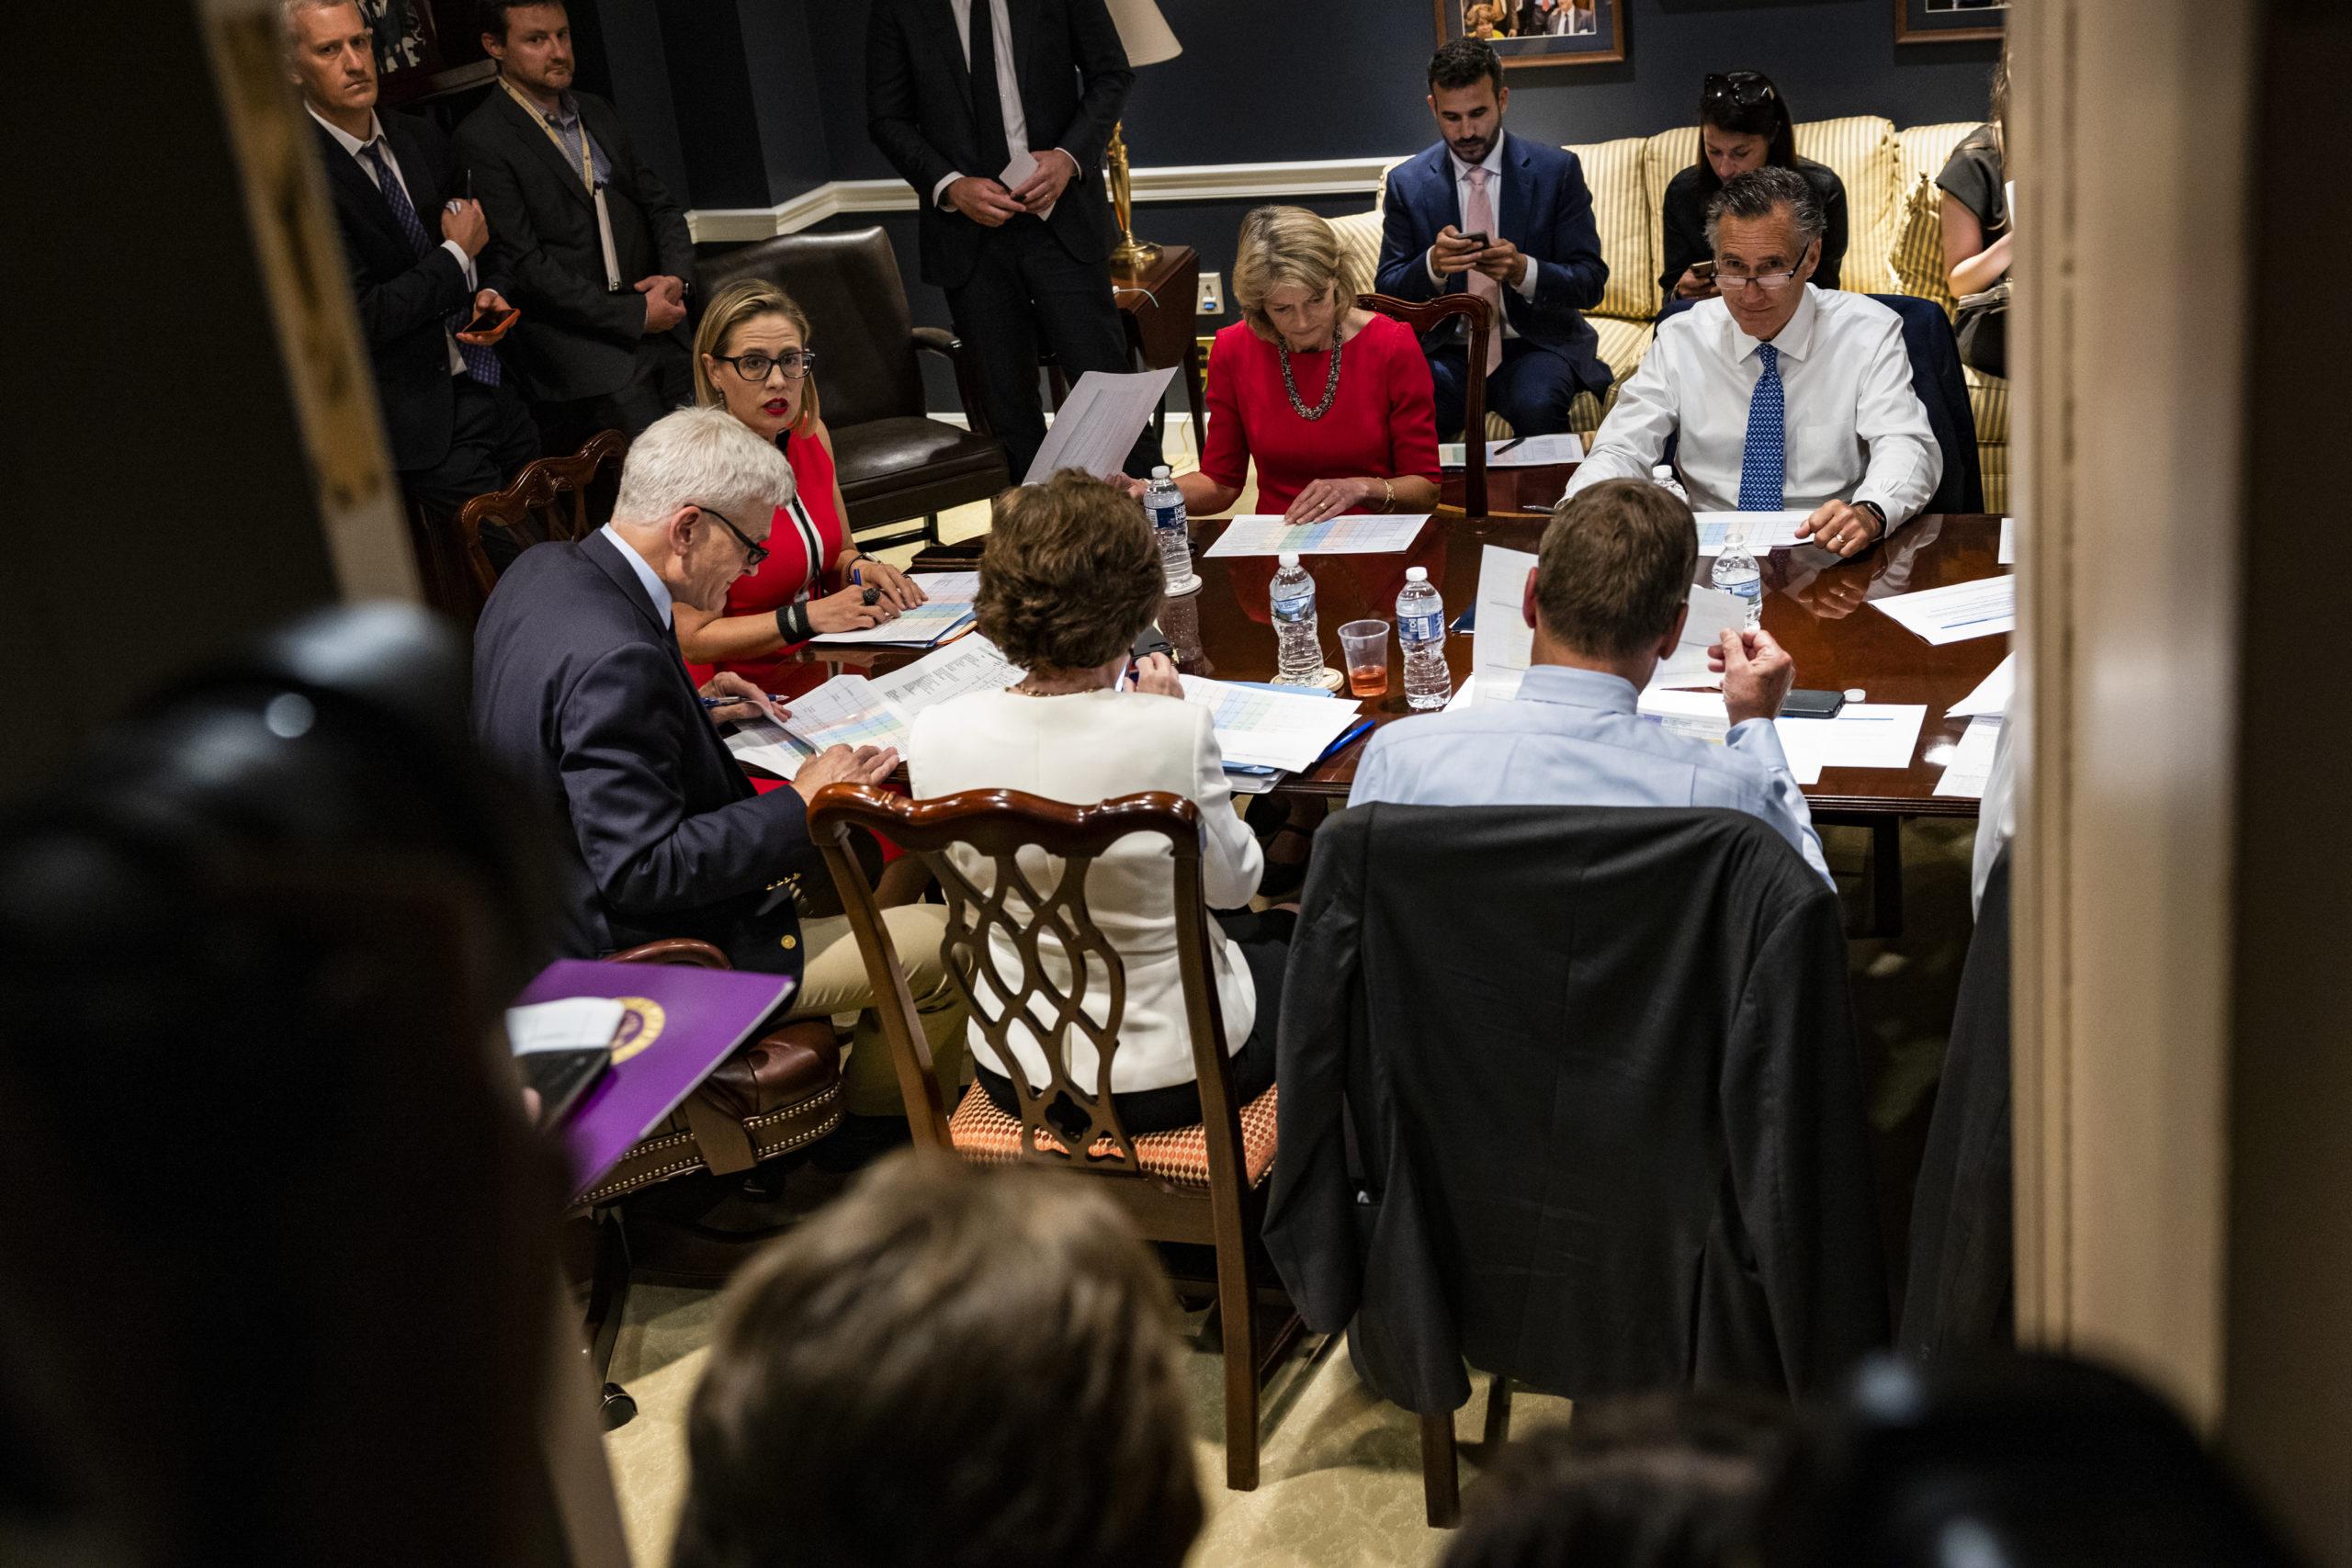 Senators Meet On New Infrastructure Plan After Talks With President Biden Collapse